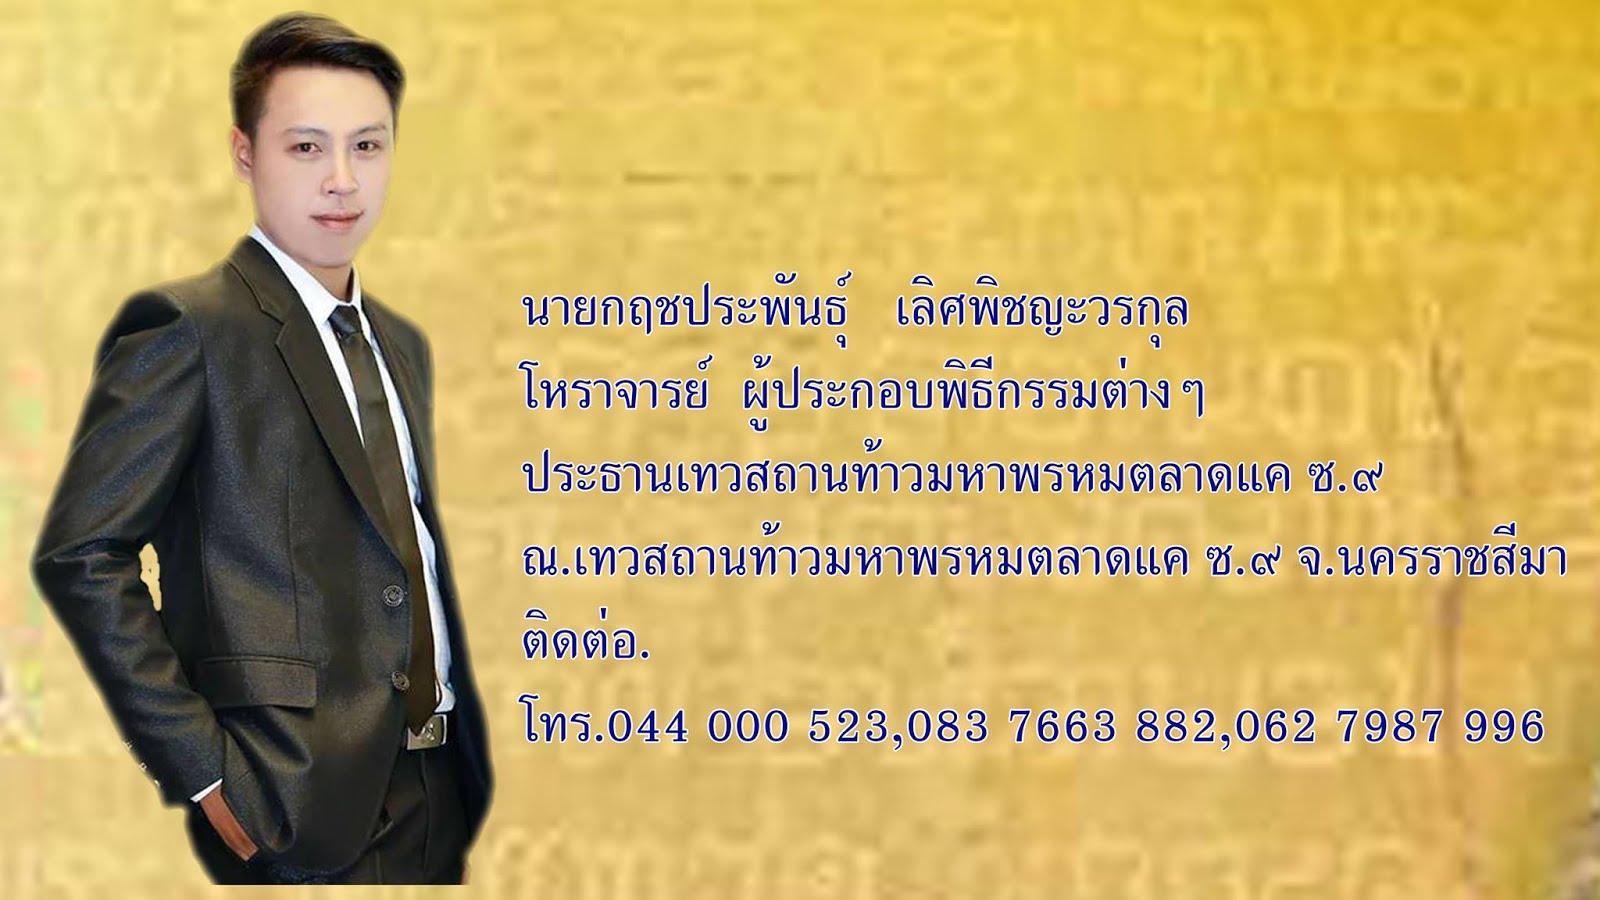 21587430_761732130685167_681879892807988107_o.jpg